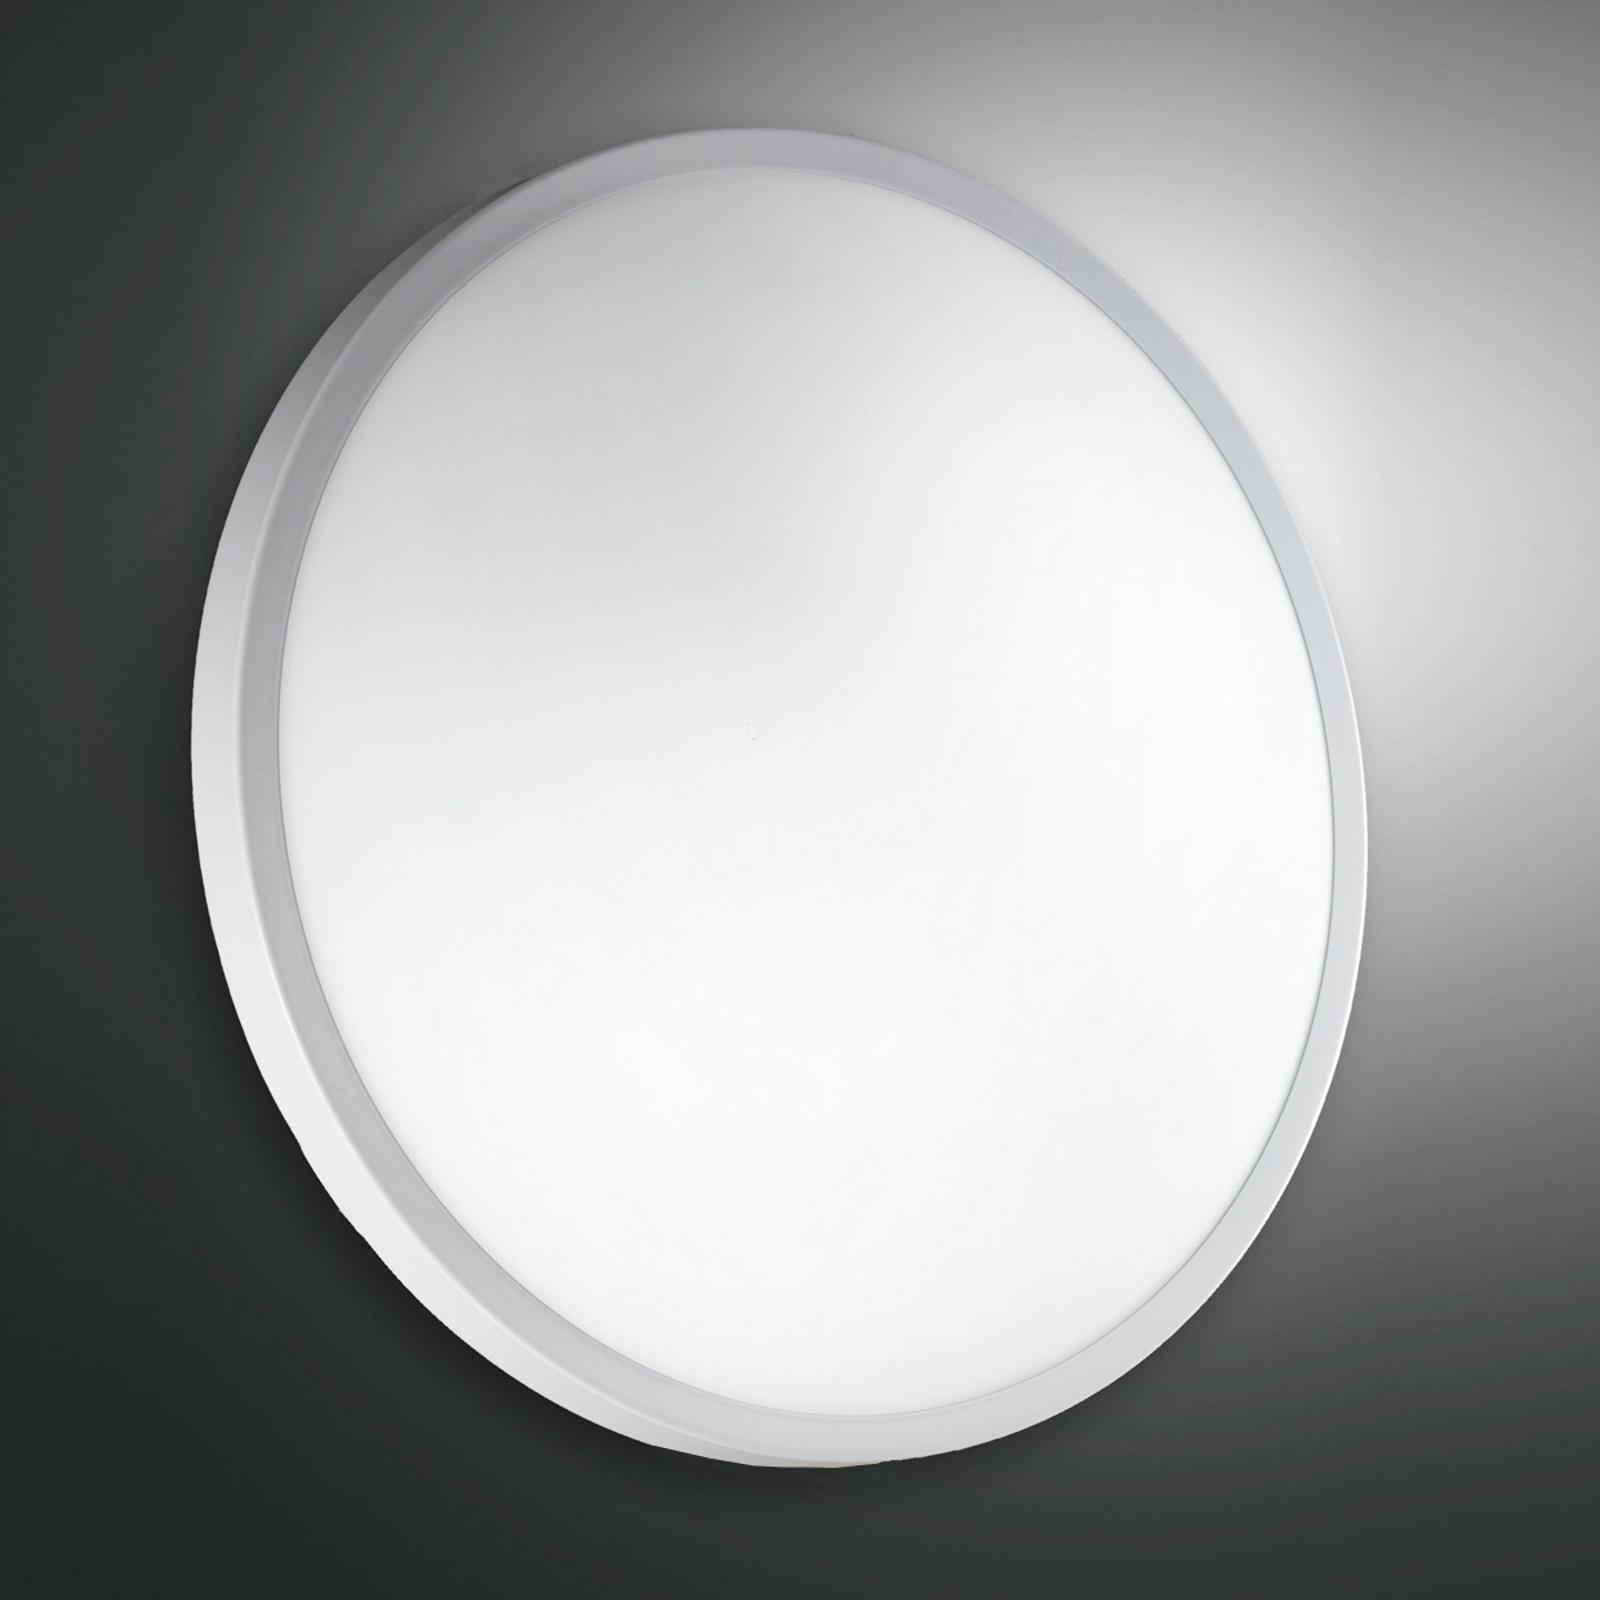 Stropné a nástenné svietidlo PLAZA zo skla 41cm_3501695_1